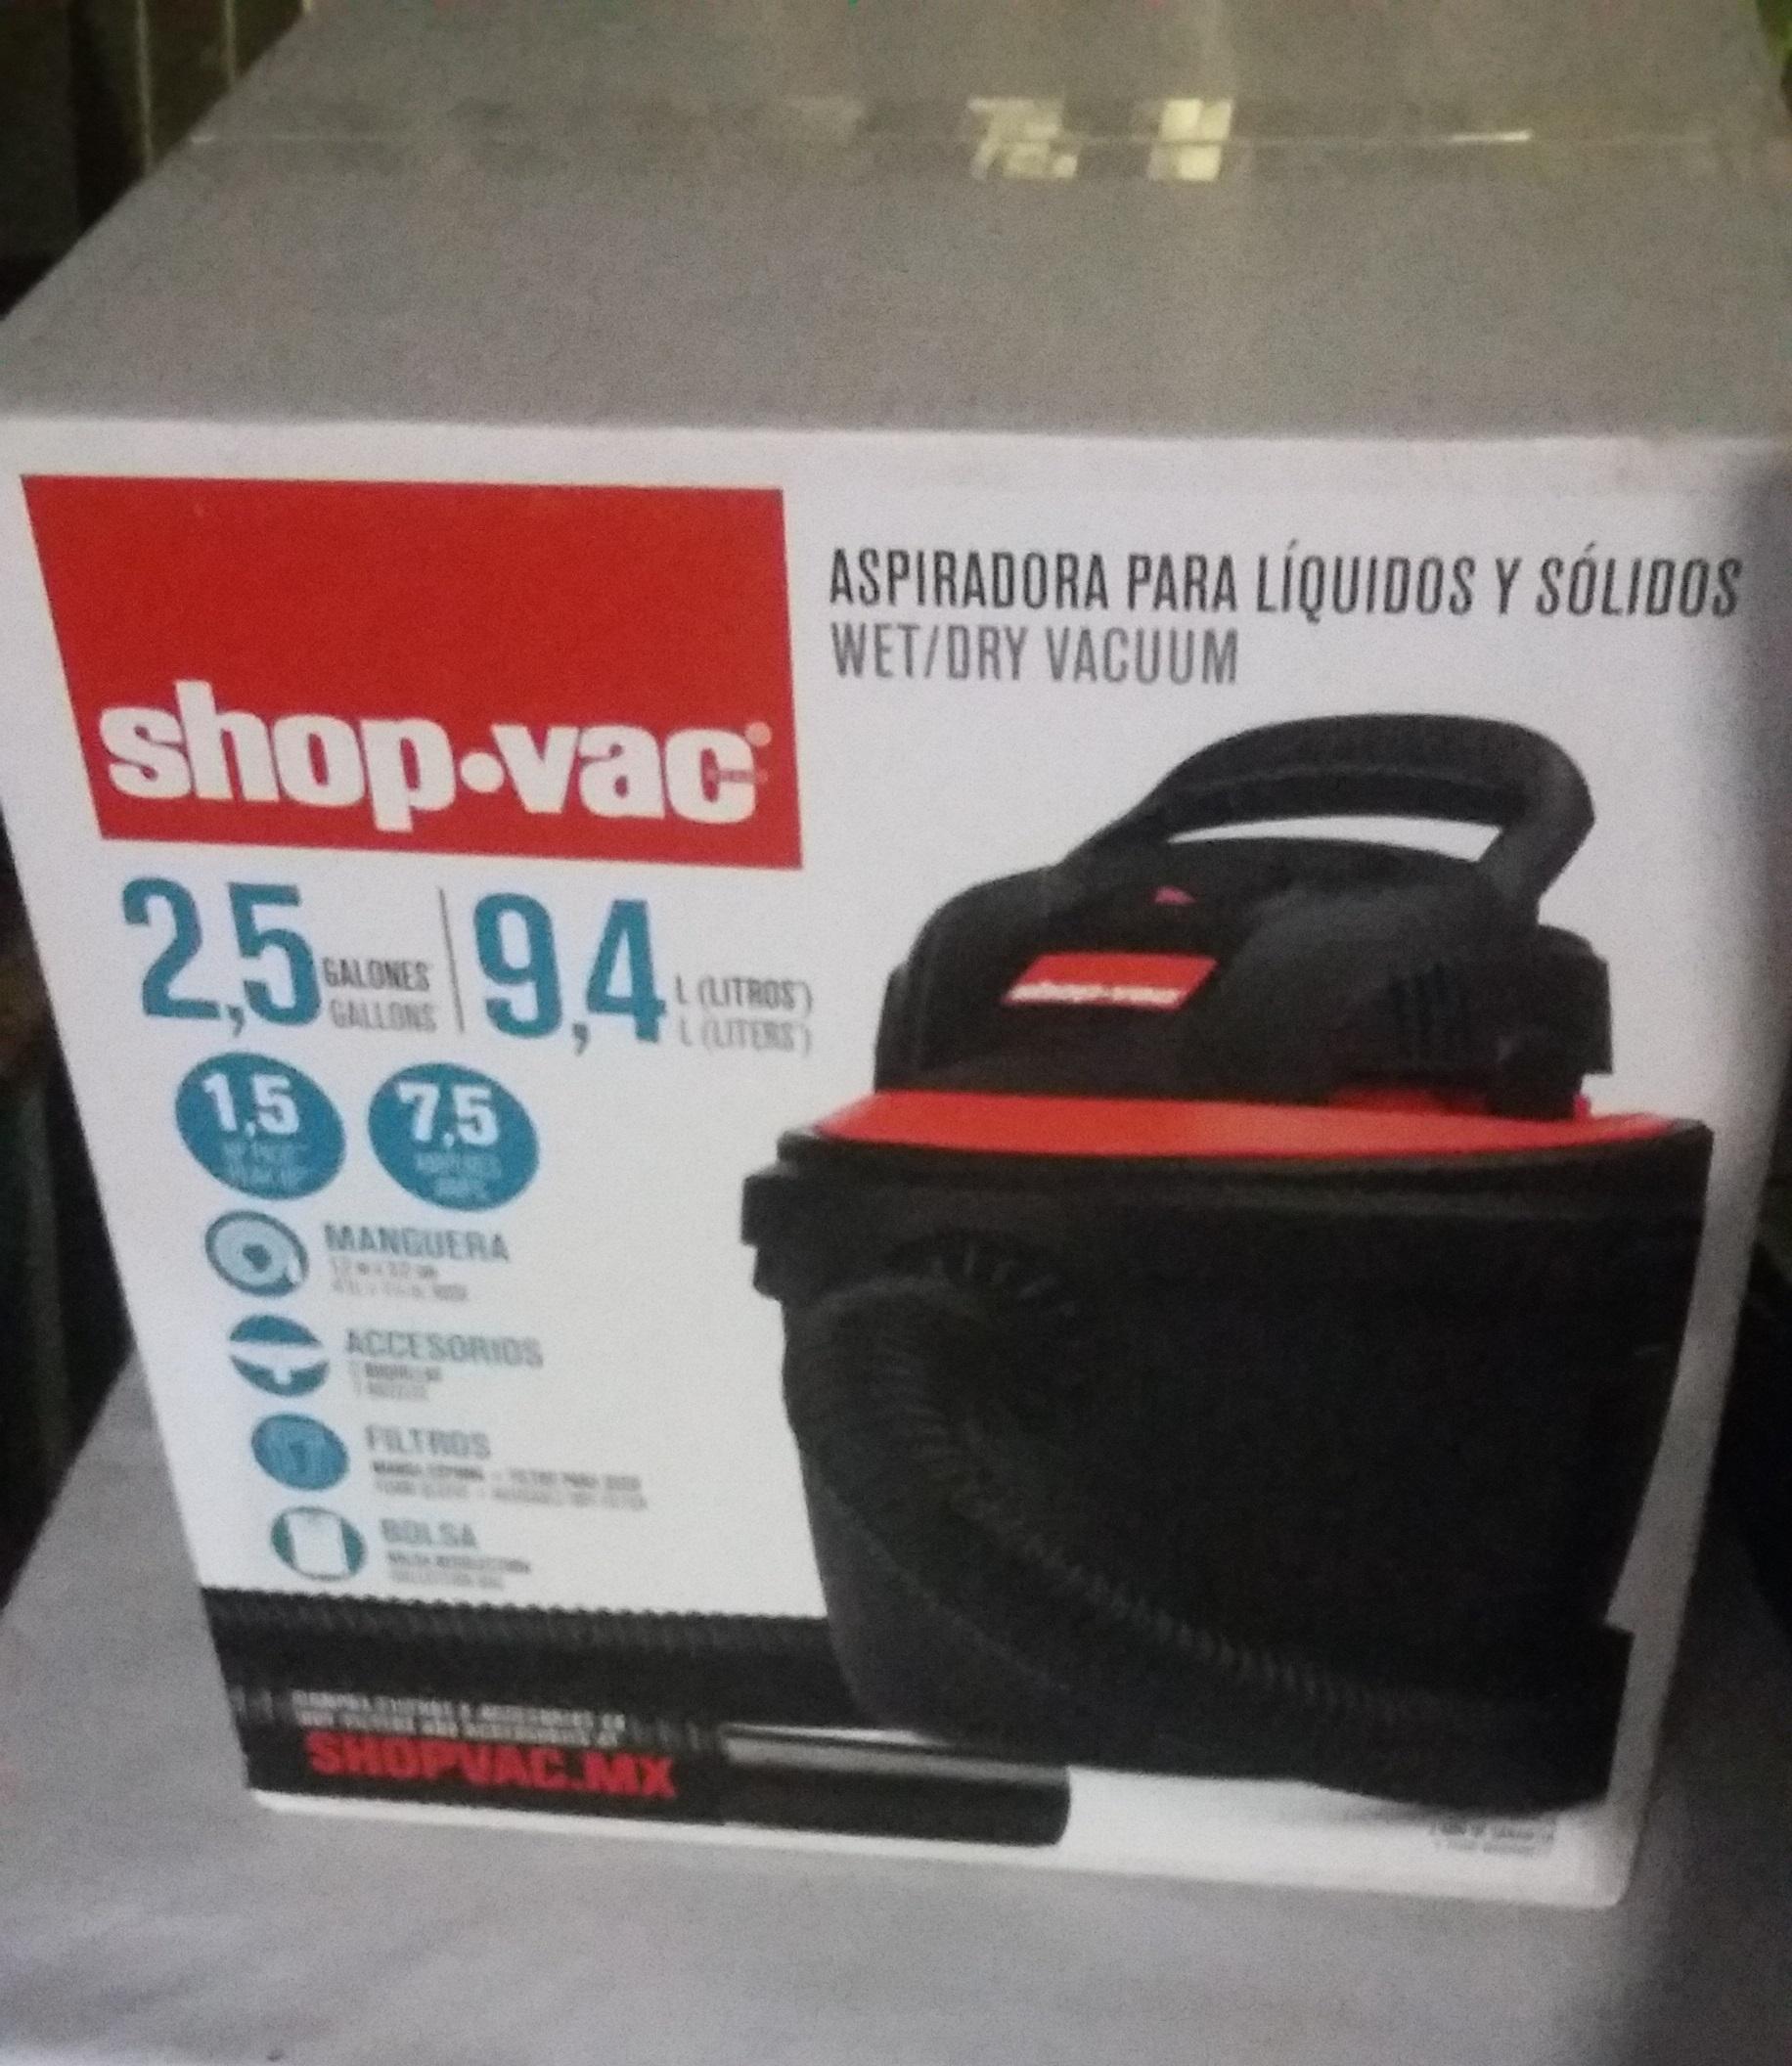 Bodega Aurrerá: Aspiradora Shop-vac 2.5 gal a $309